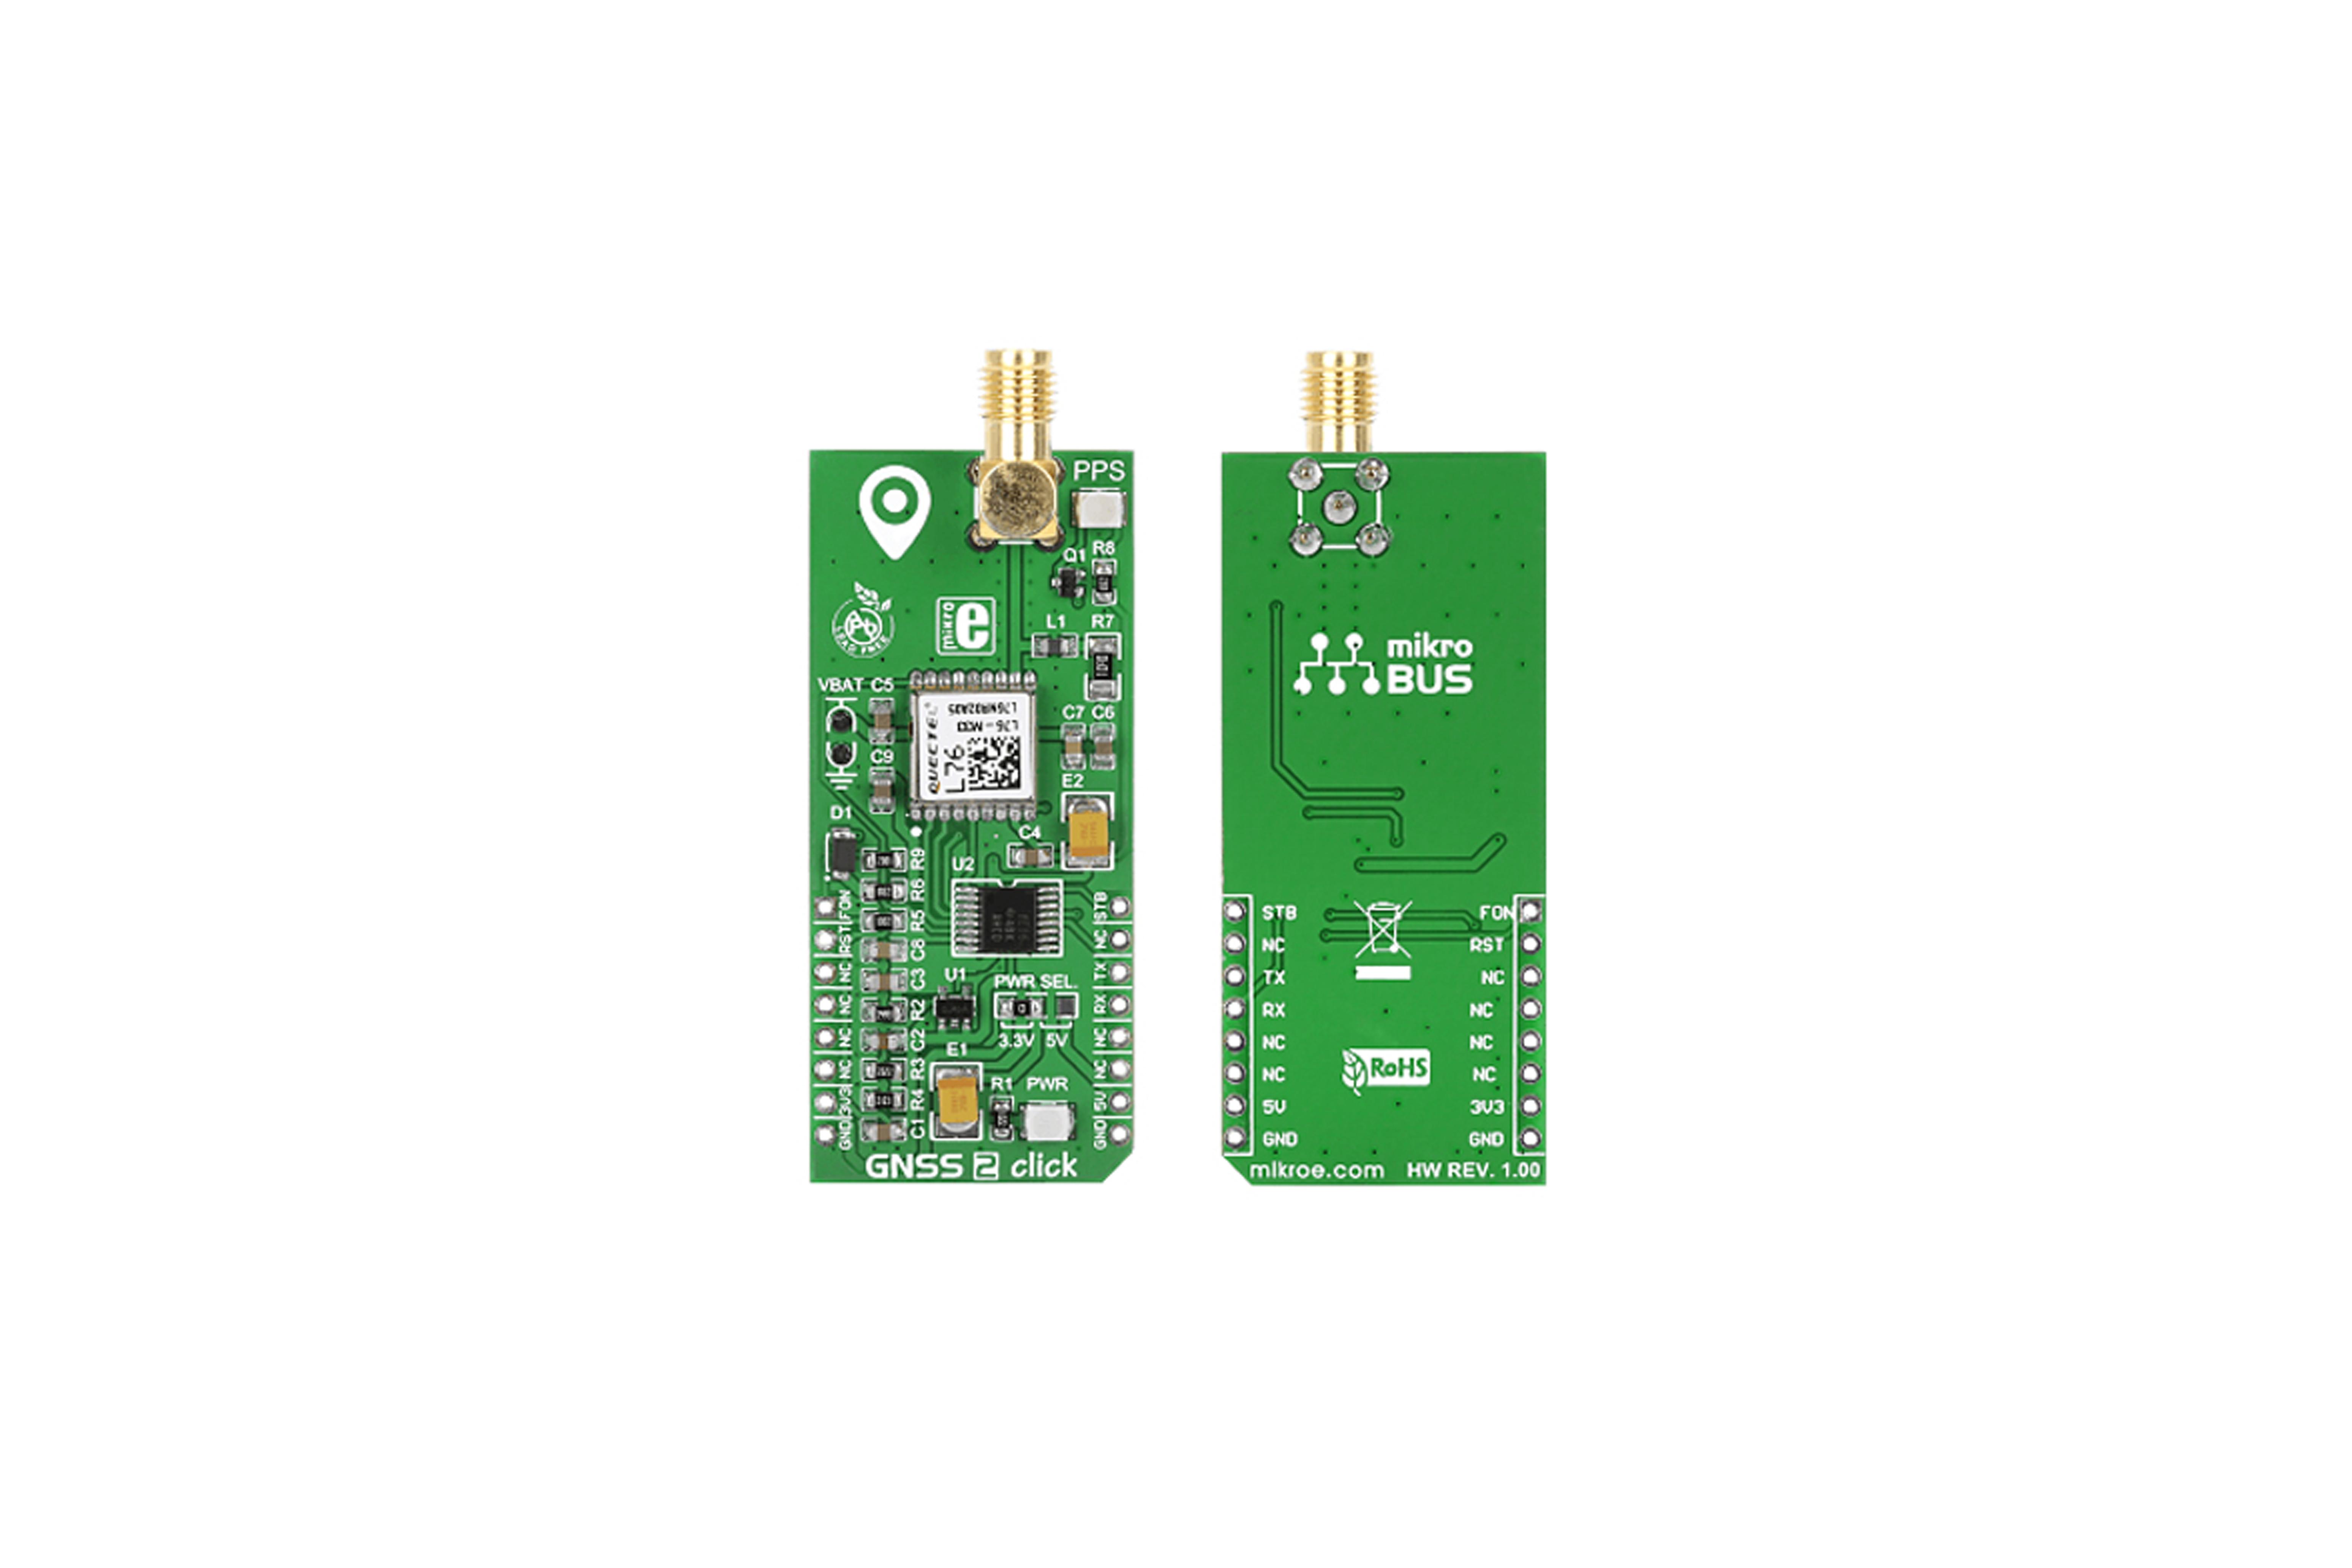 MikroElektronika GNSS2 GPS mikroBus Click Board voor L76